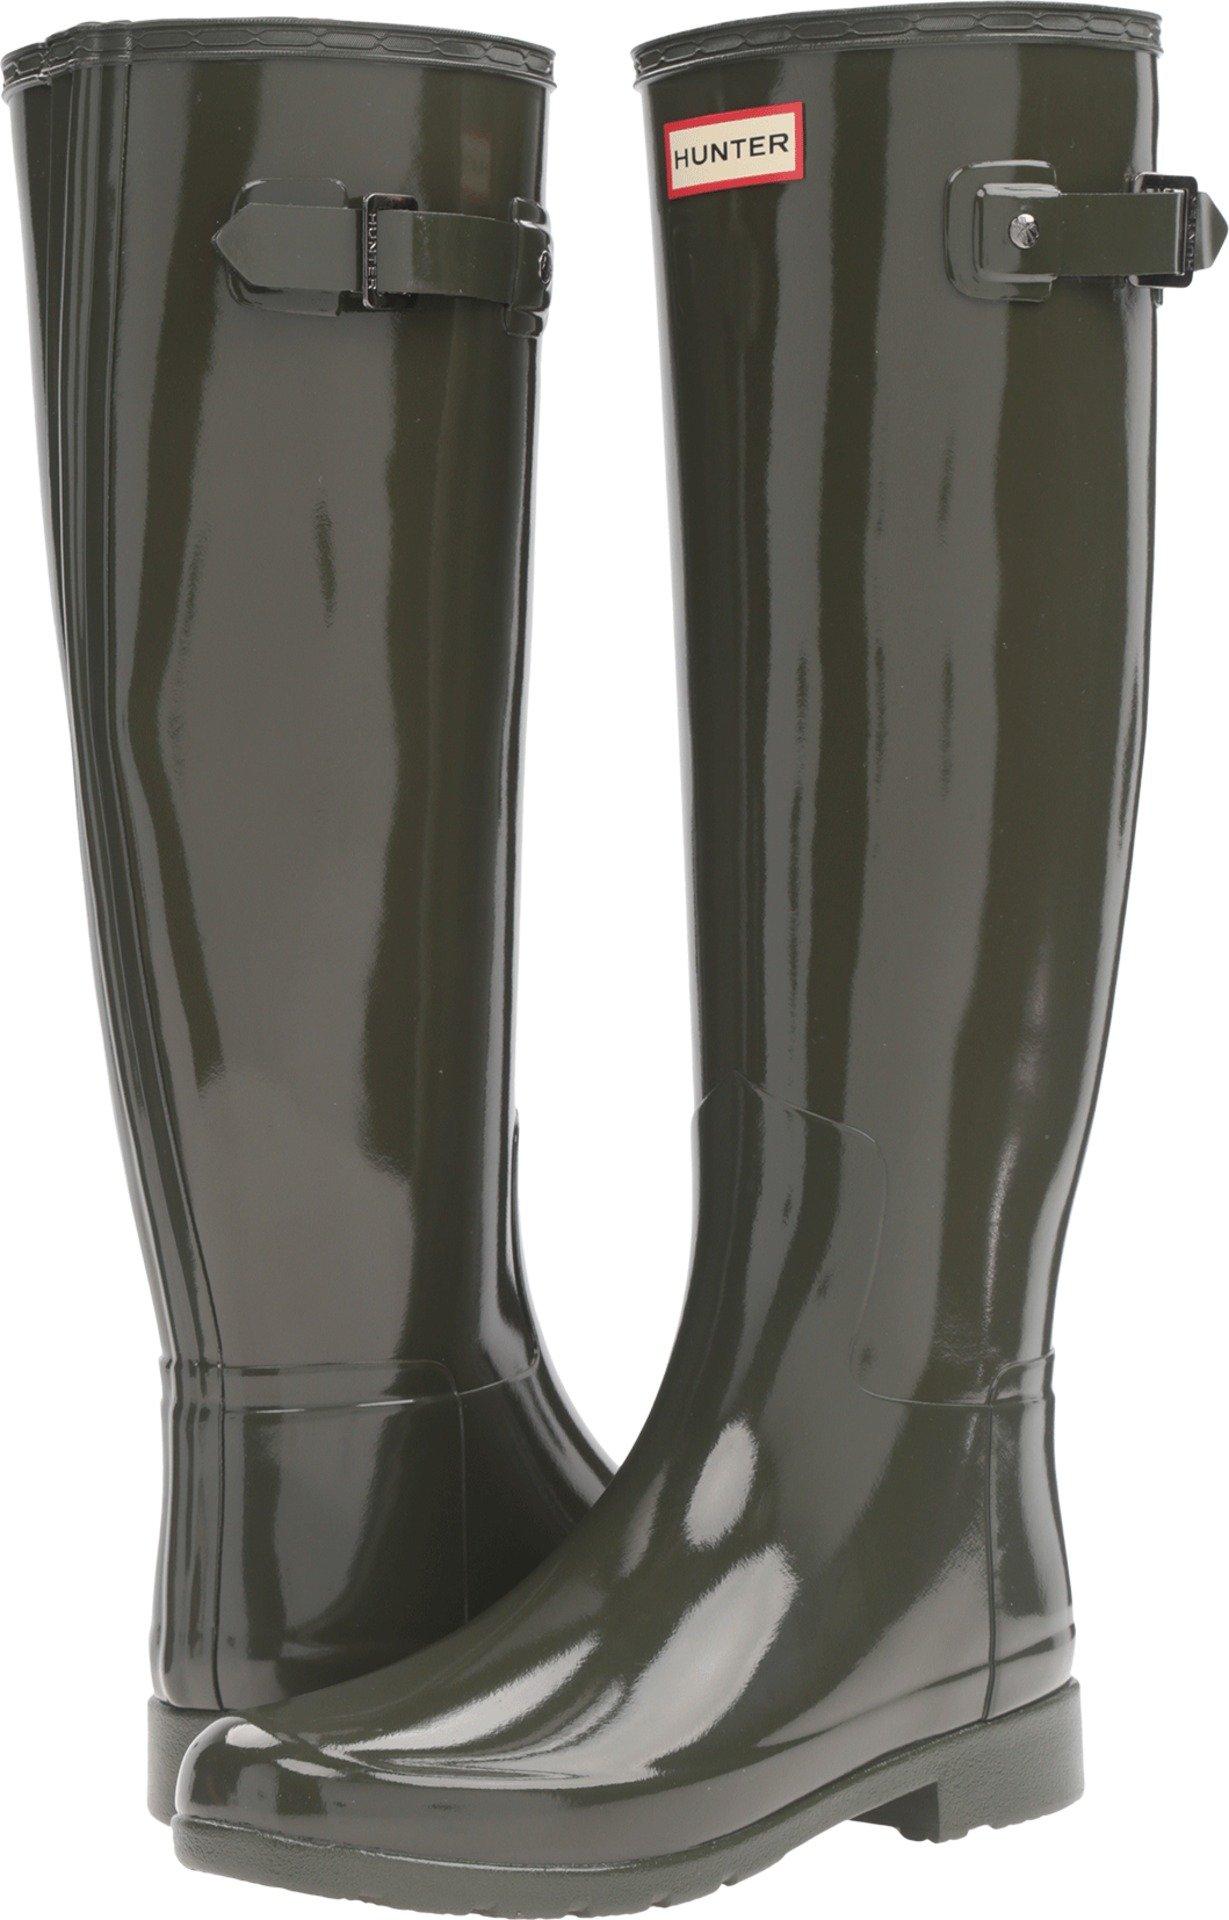 Hunter Women's Original Refined Gloss Rain Boots Dark Olive 11 M US